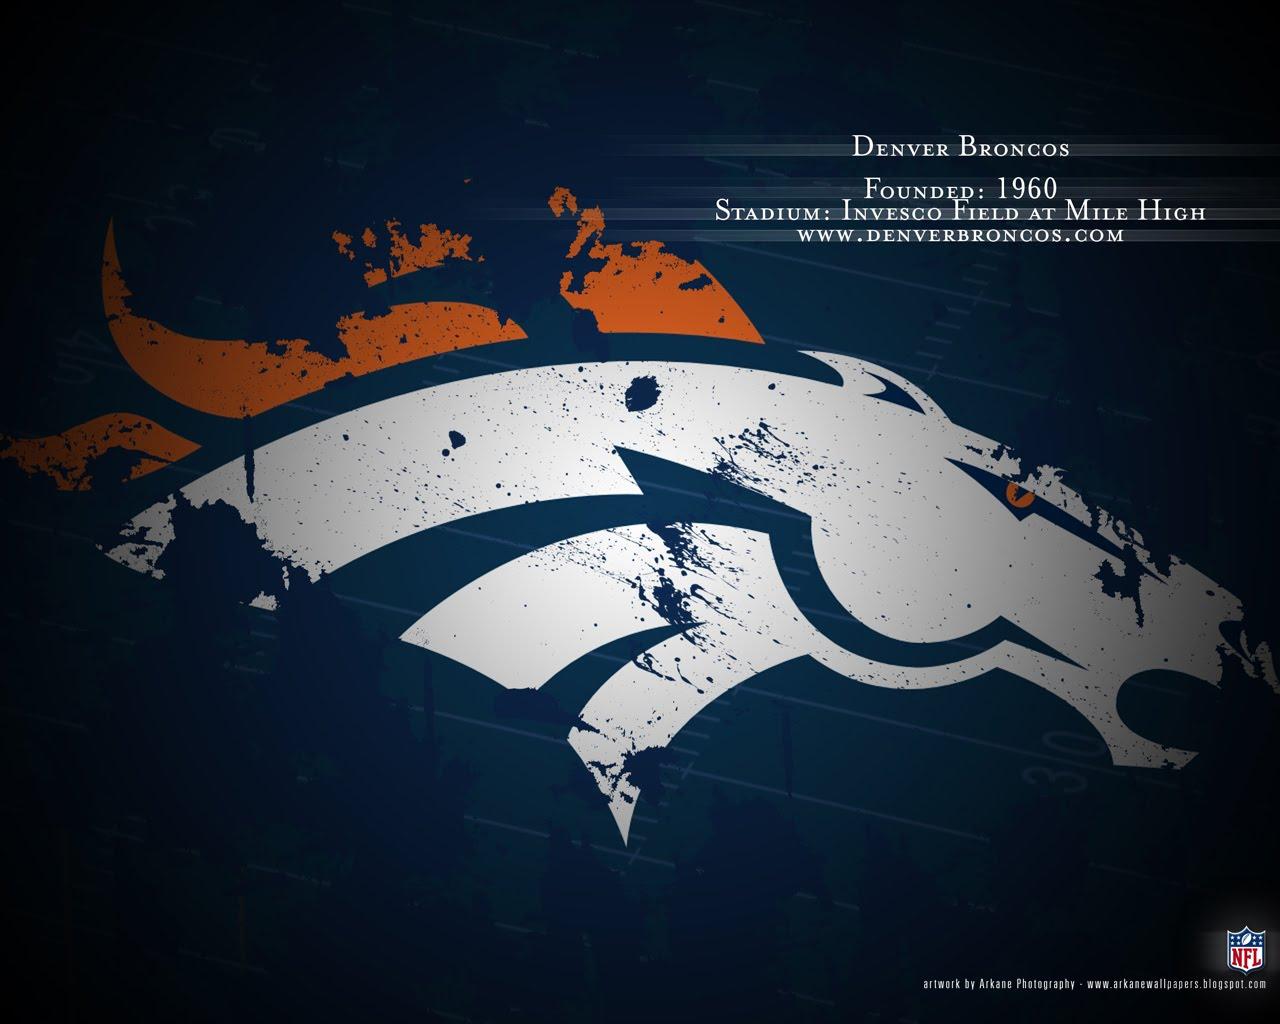 Broncos lessons tes teach arkane nfl wallpapers profile denver broncos voltagebd Gallery